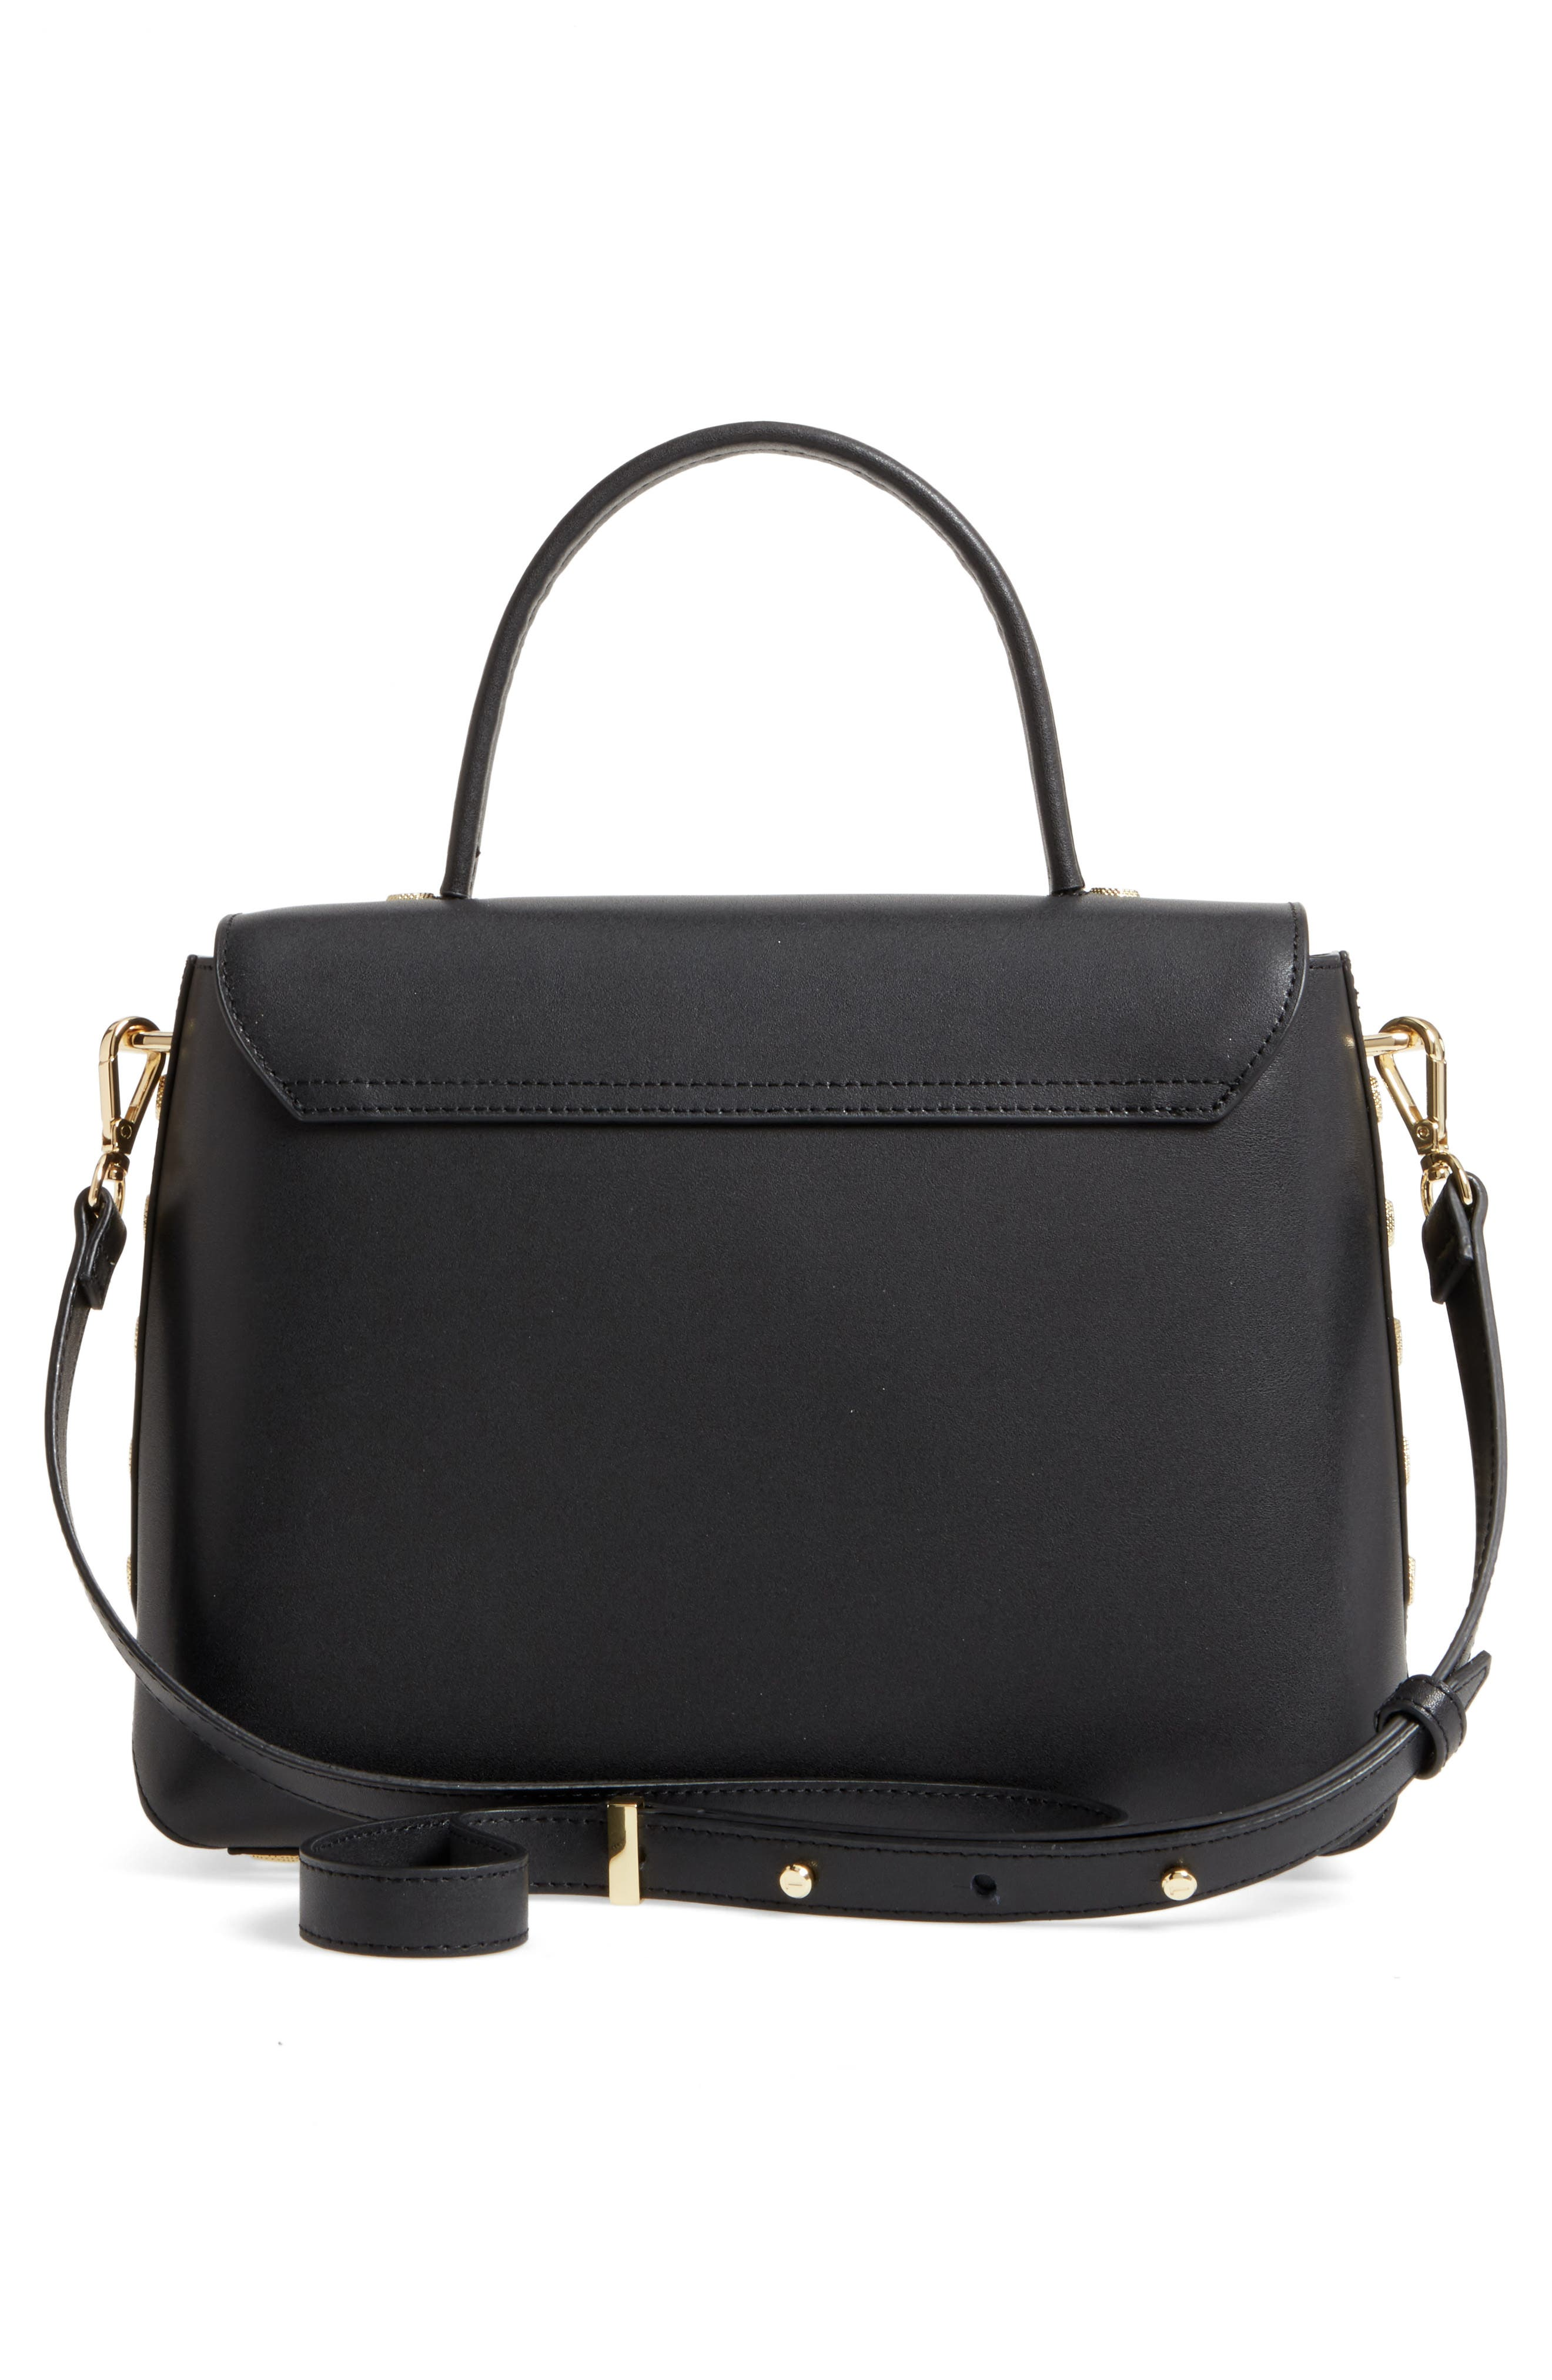 Taymar - Studded Edge Lady Bag Leather Top Handle Satchel,                             Alternate thumbnail 3, color,                             001